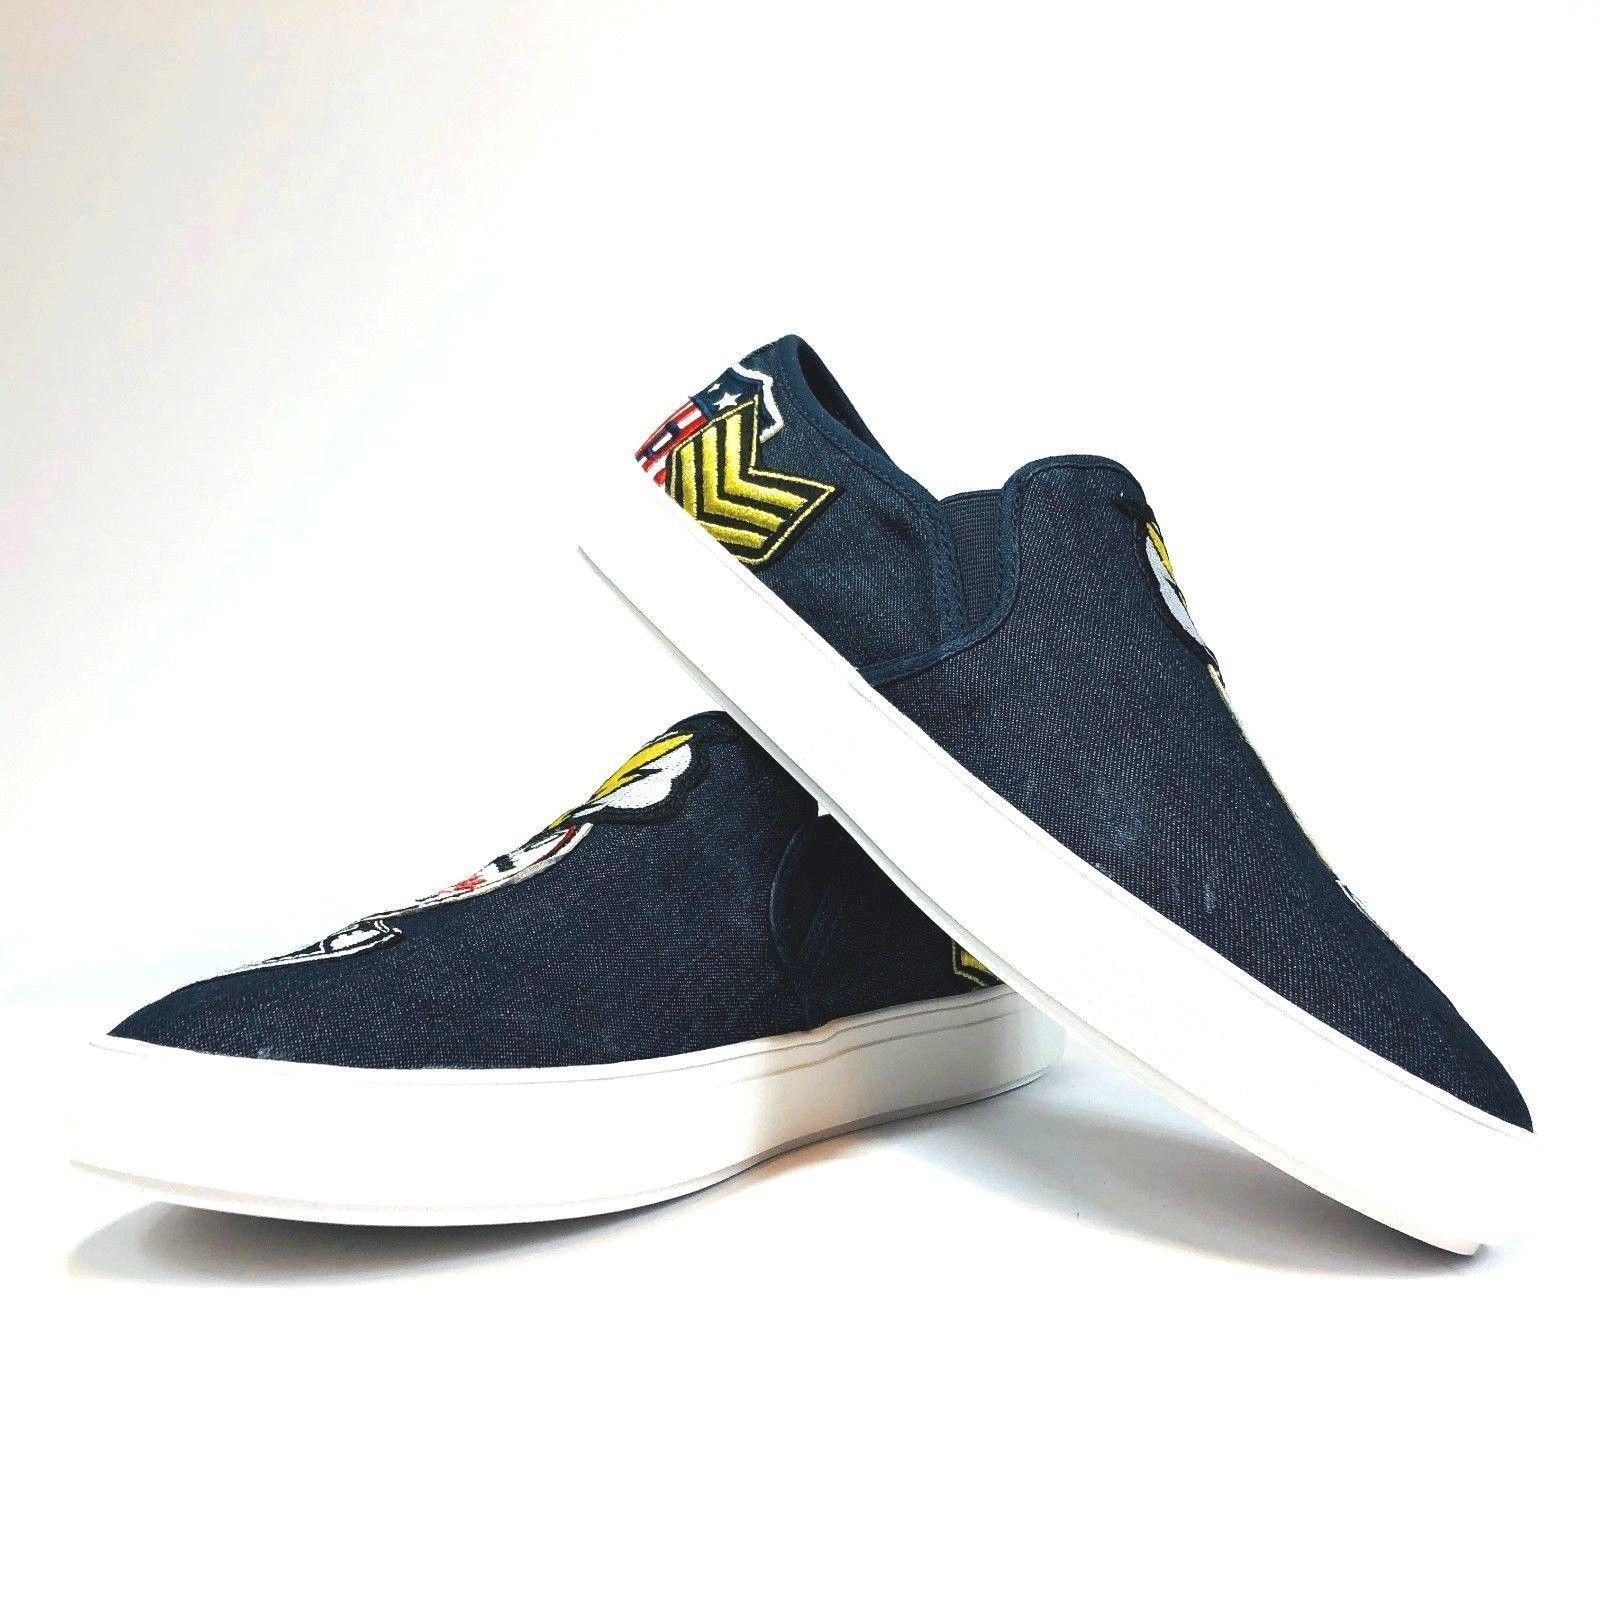 Steve Madden Wasdin Navy Blue or Military Denim Slip On Loafers Mens Vintage image 2